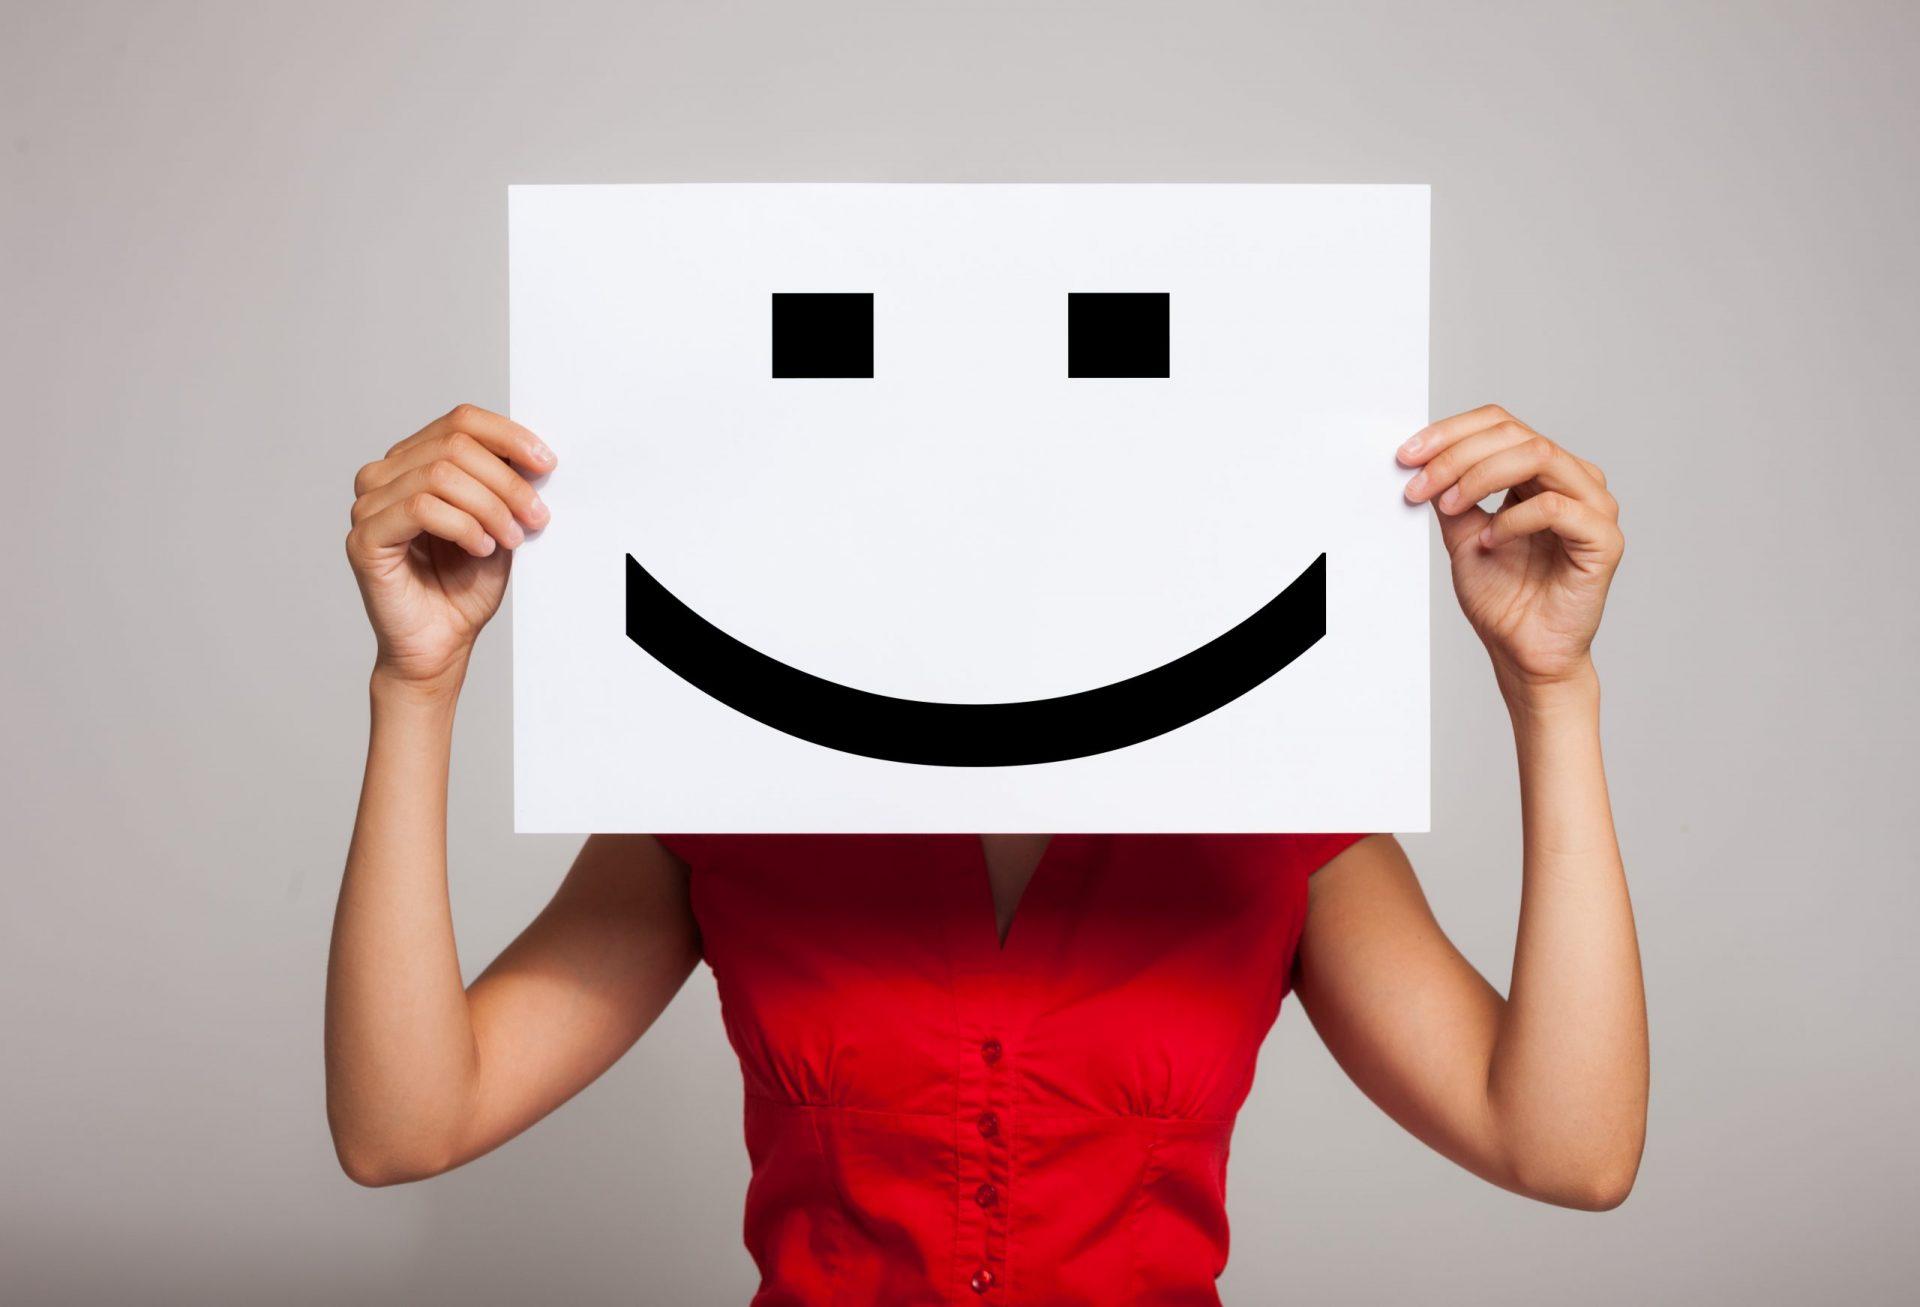 smiley cardboard representing happy affiliate doing email marketing for affiliate marketing